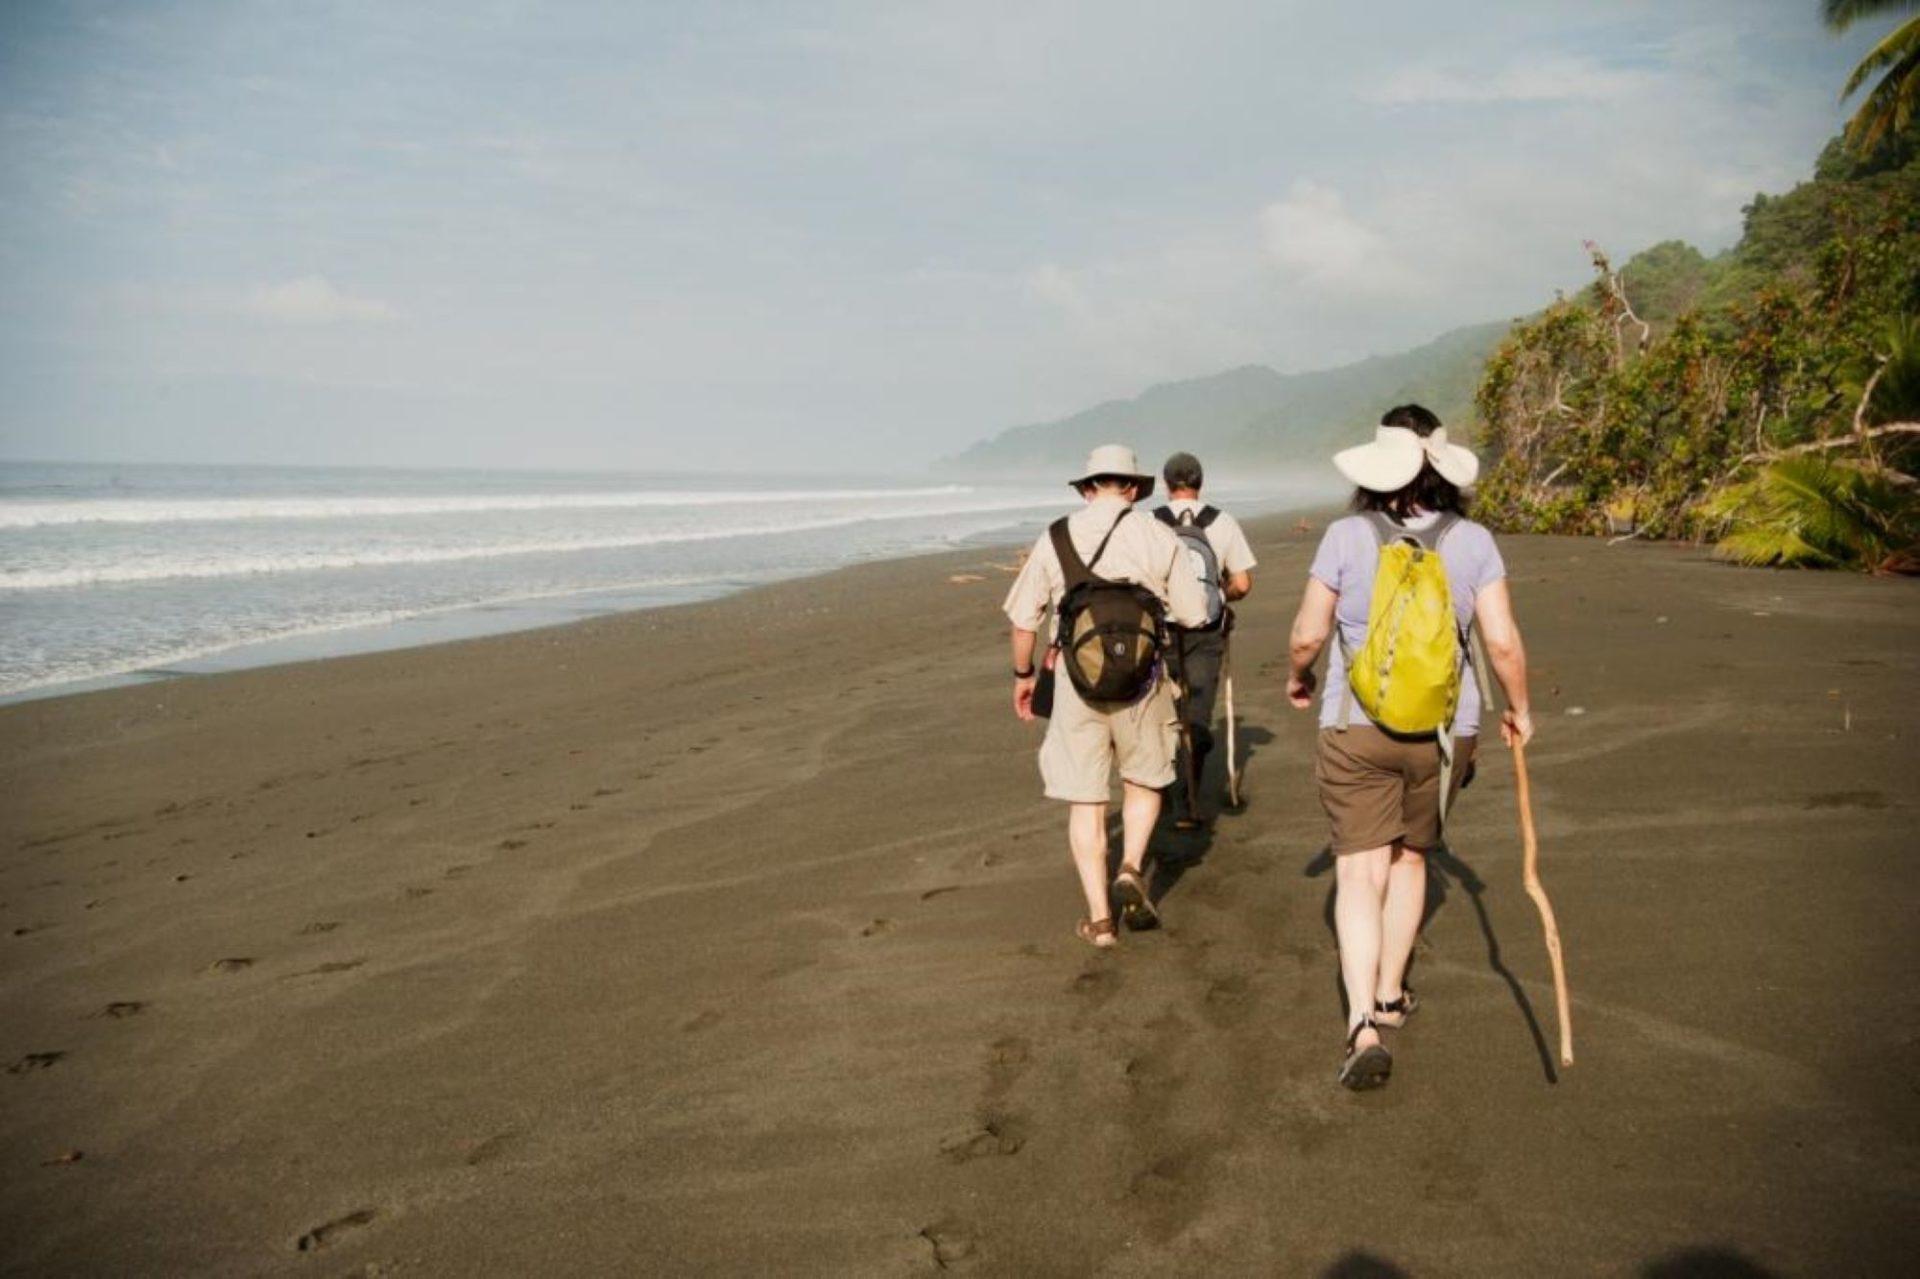 wp-content/uploads/itineraries/Costa-Rica/CRWildlifeDay3.jpg